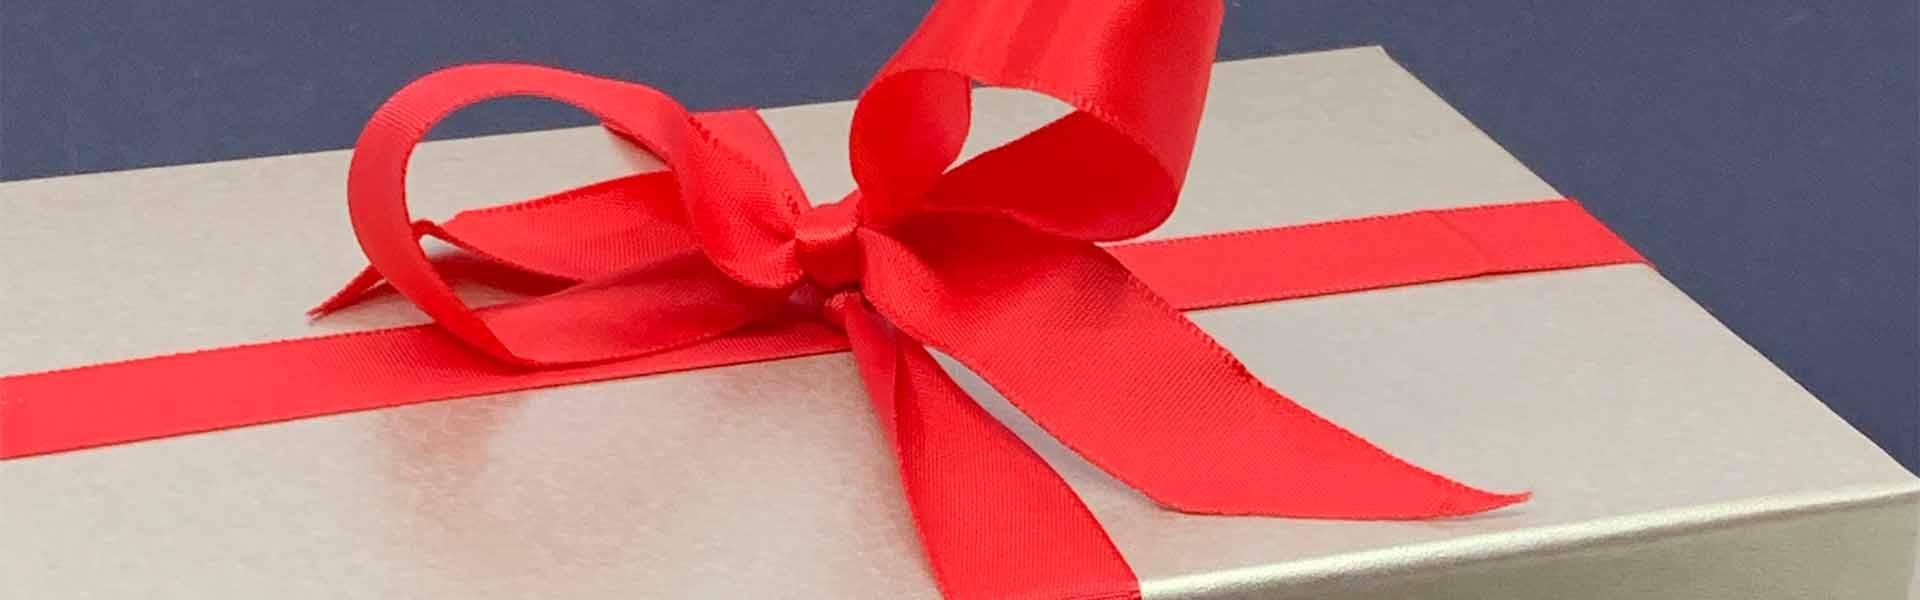 slider-geschenkverpackung